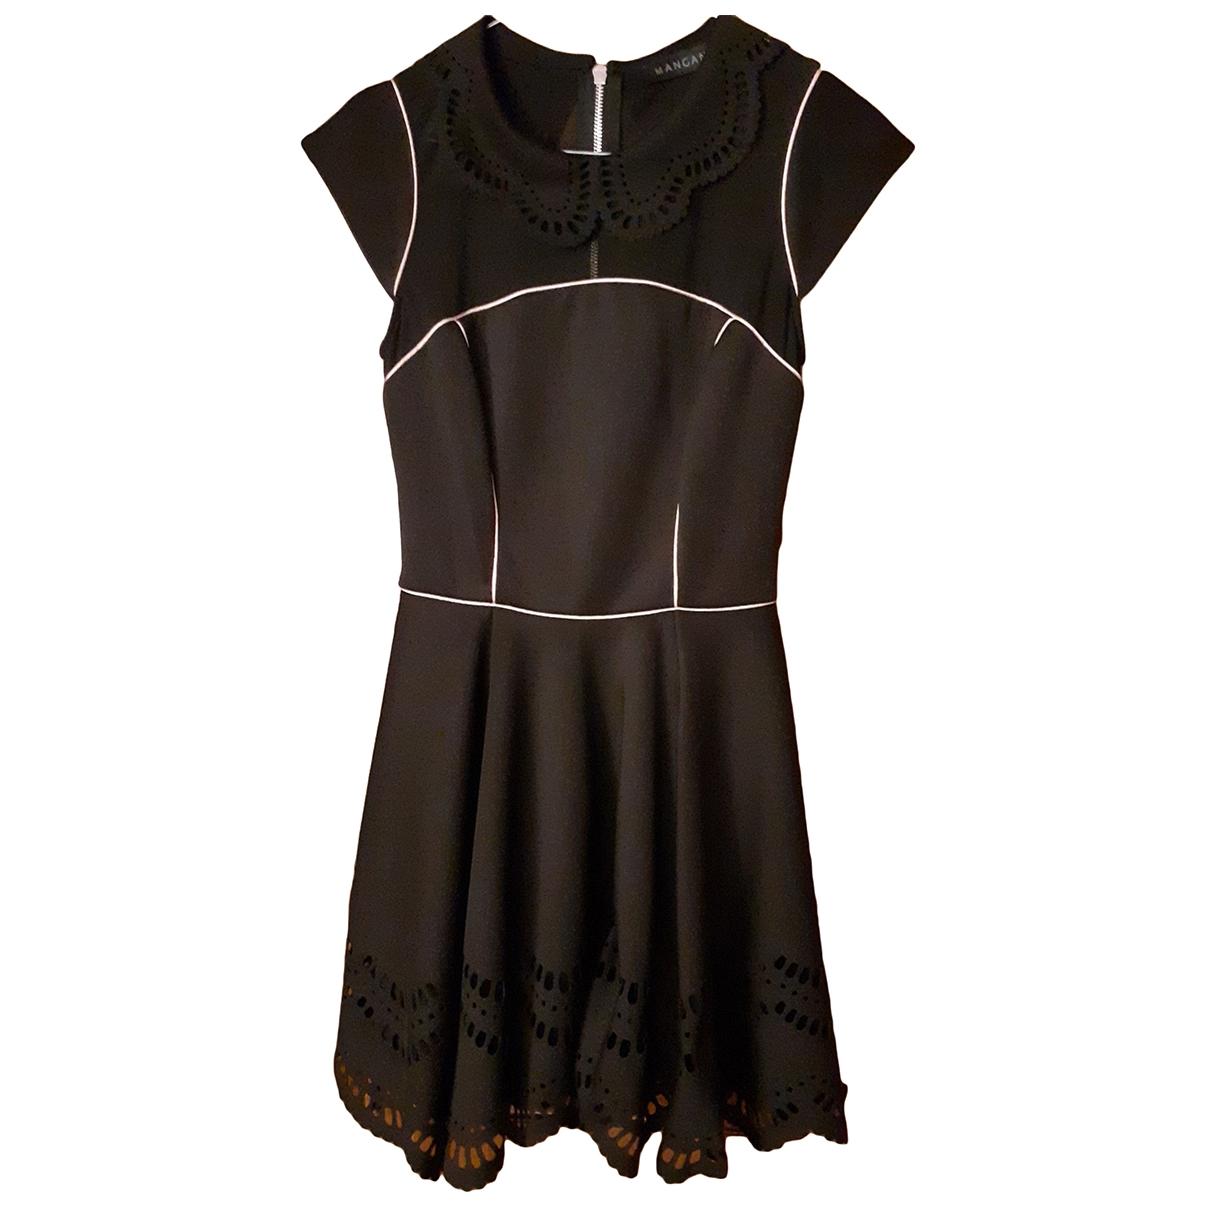 Mangano \N Kleid in  Schwarz Synthetik